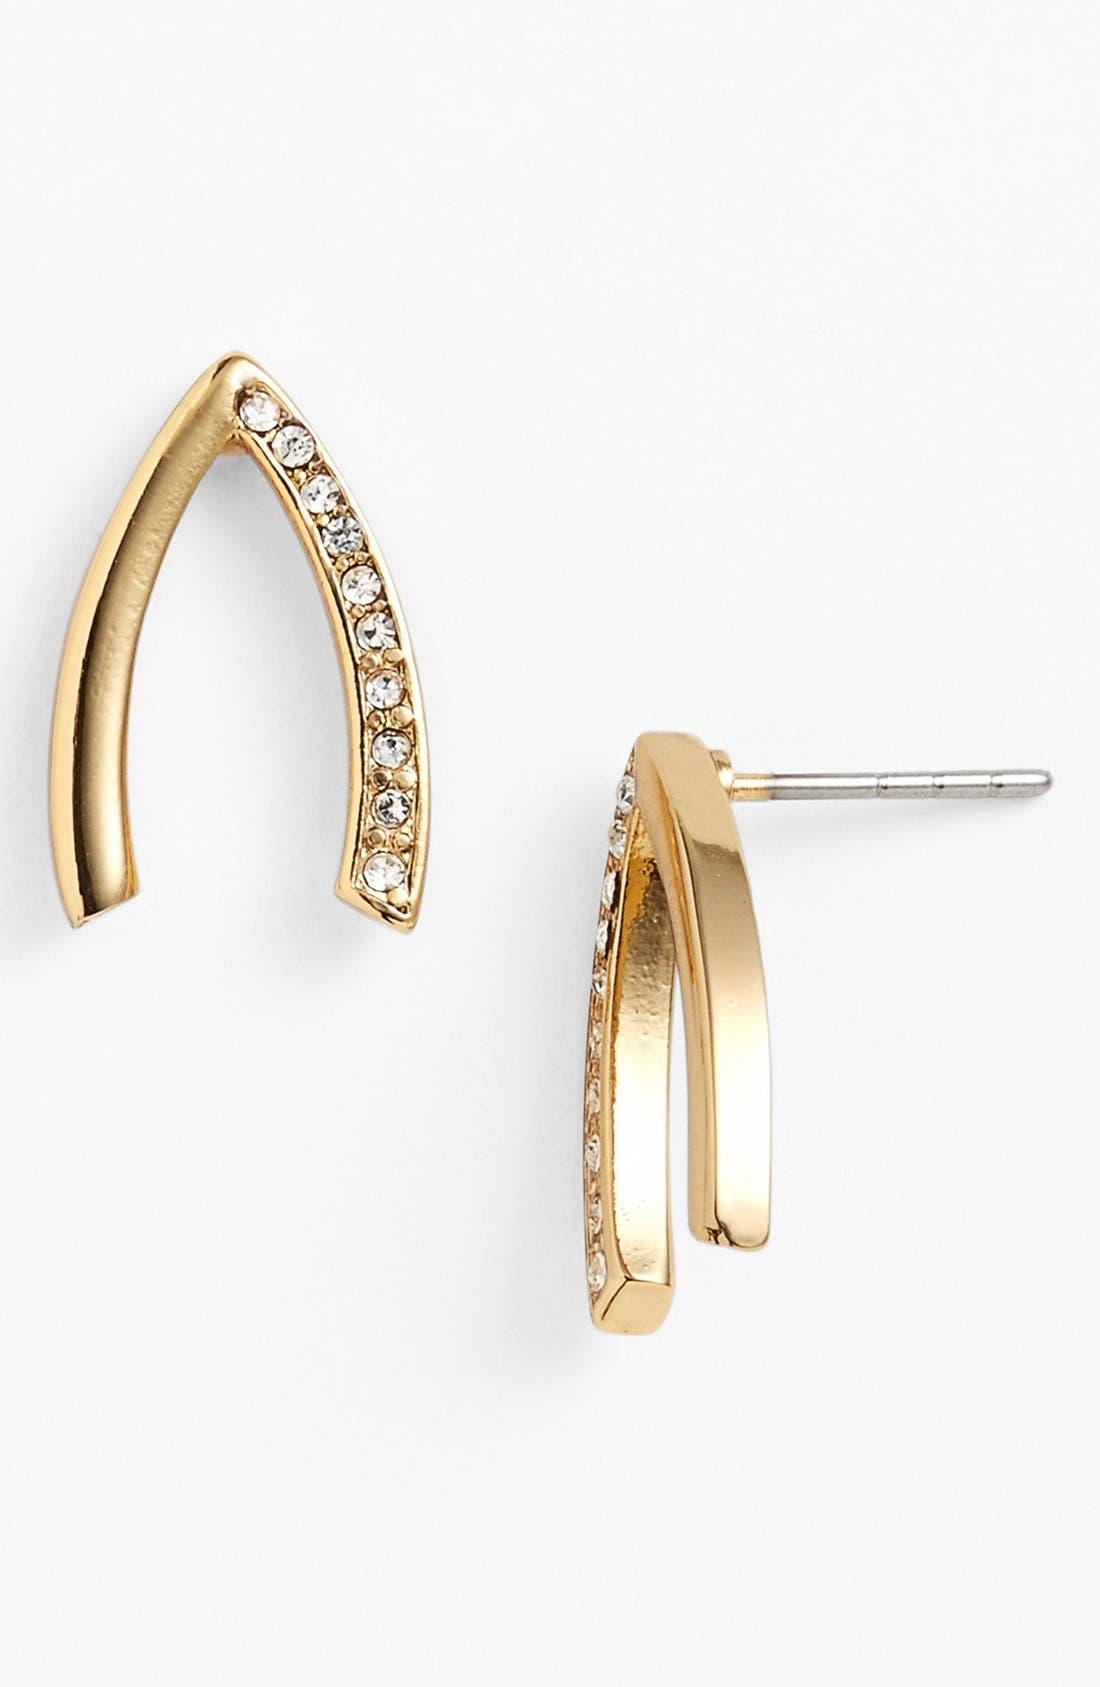 Alternate Image 1 Selected - Rebecca Minkoff 'Jewel Box' Wishbone Stud Earrings